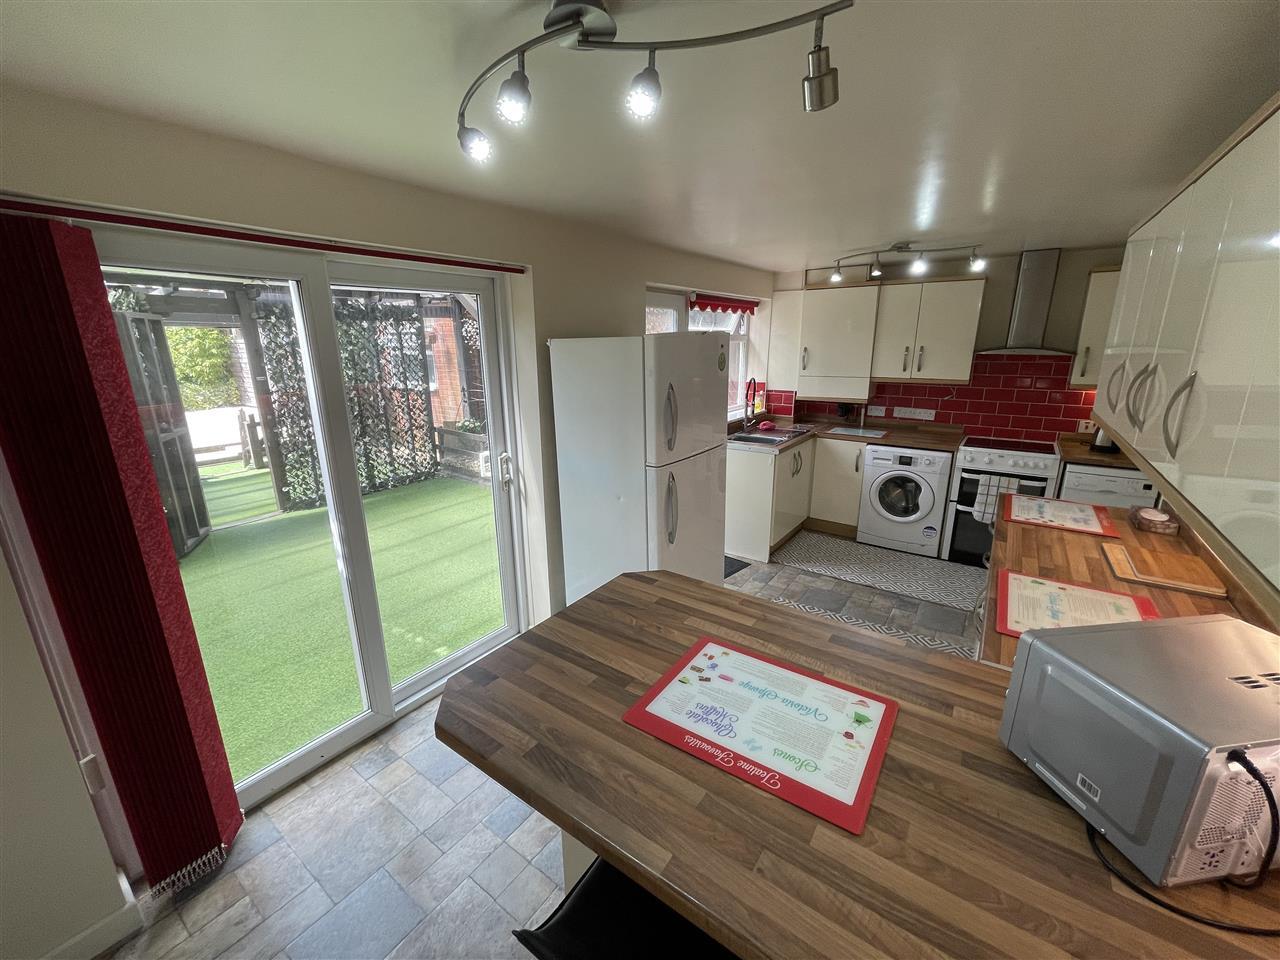 3 bed semi-detached for sale in Balmoral, Adlington, Adlington 6